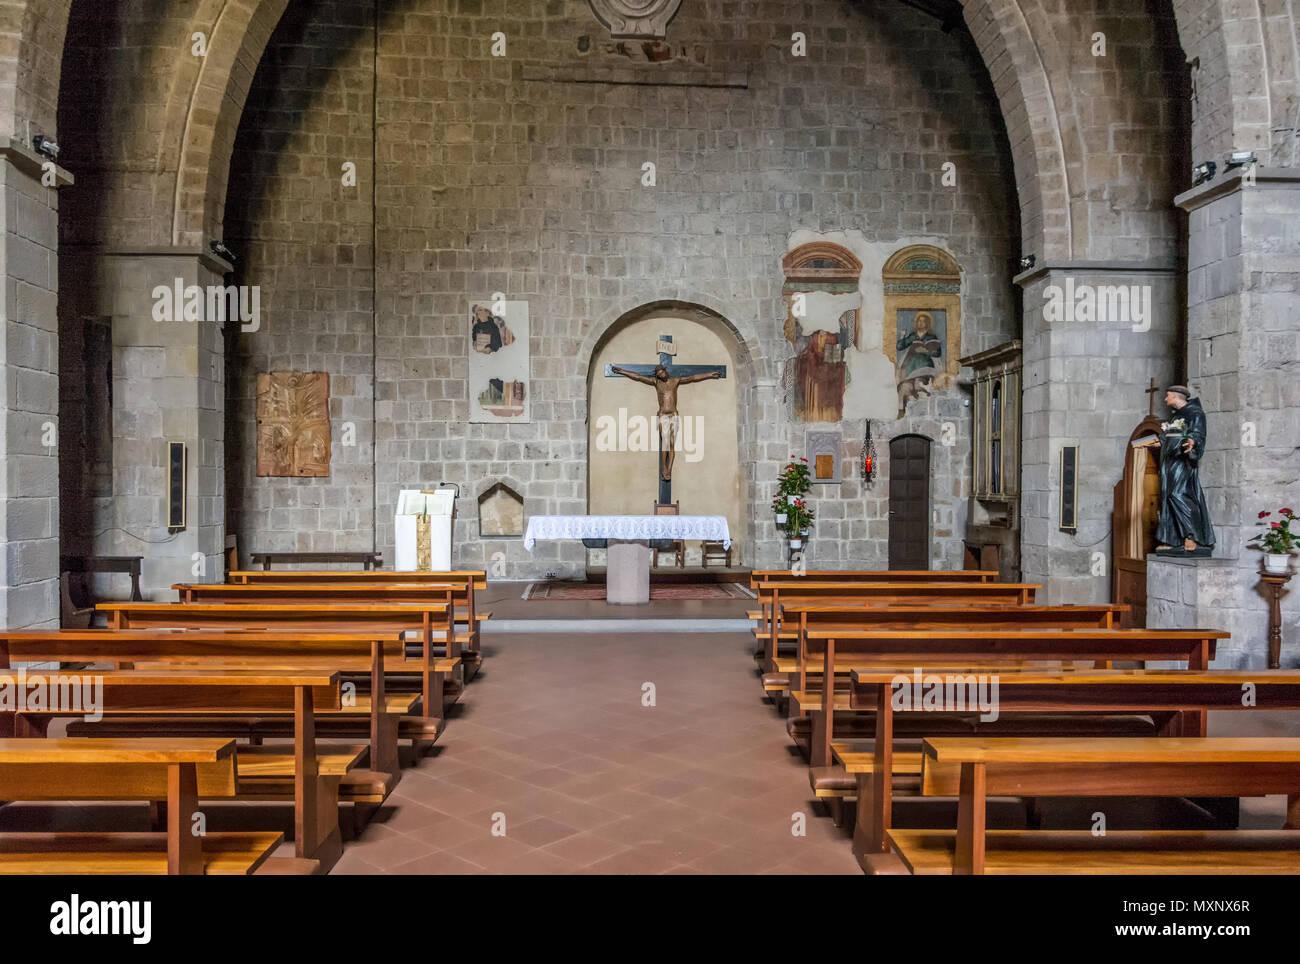 Tuscania (Viterbo), Italy - 2 may, 2018: Interior of San Marco ...